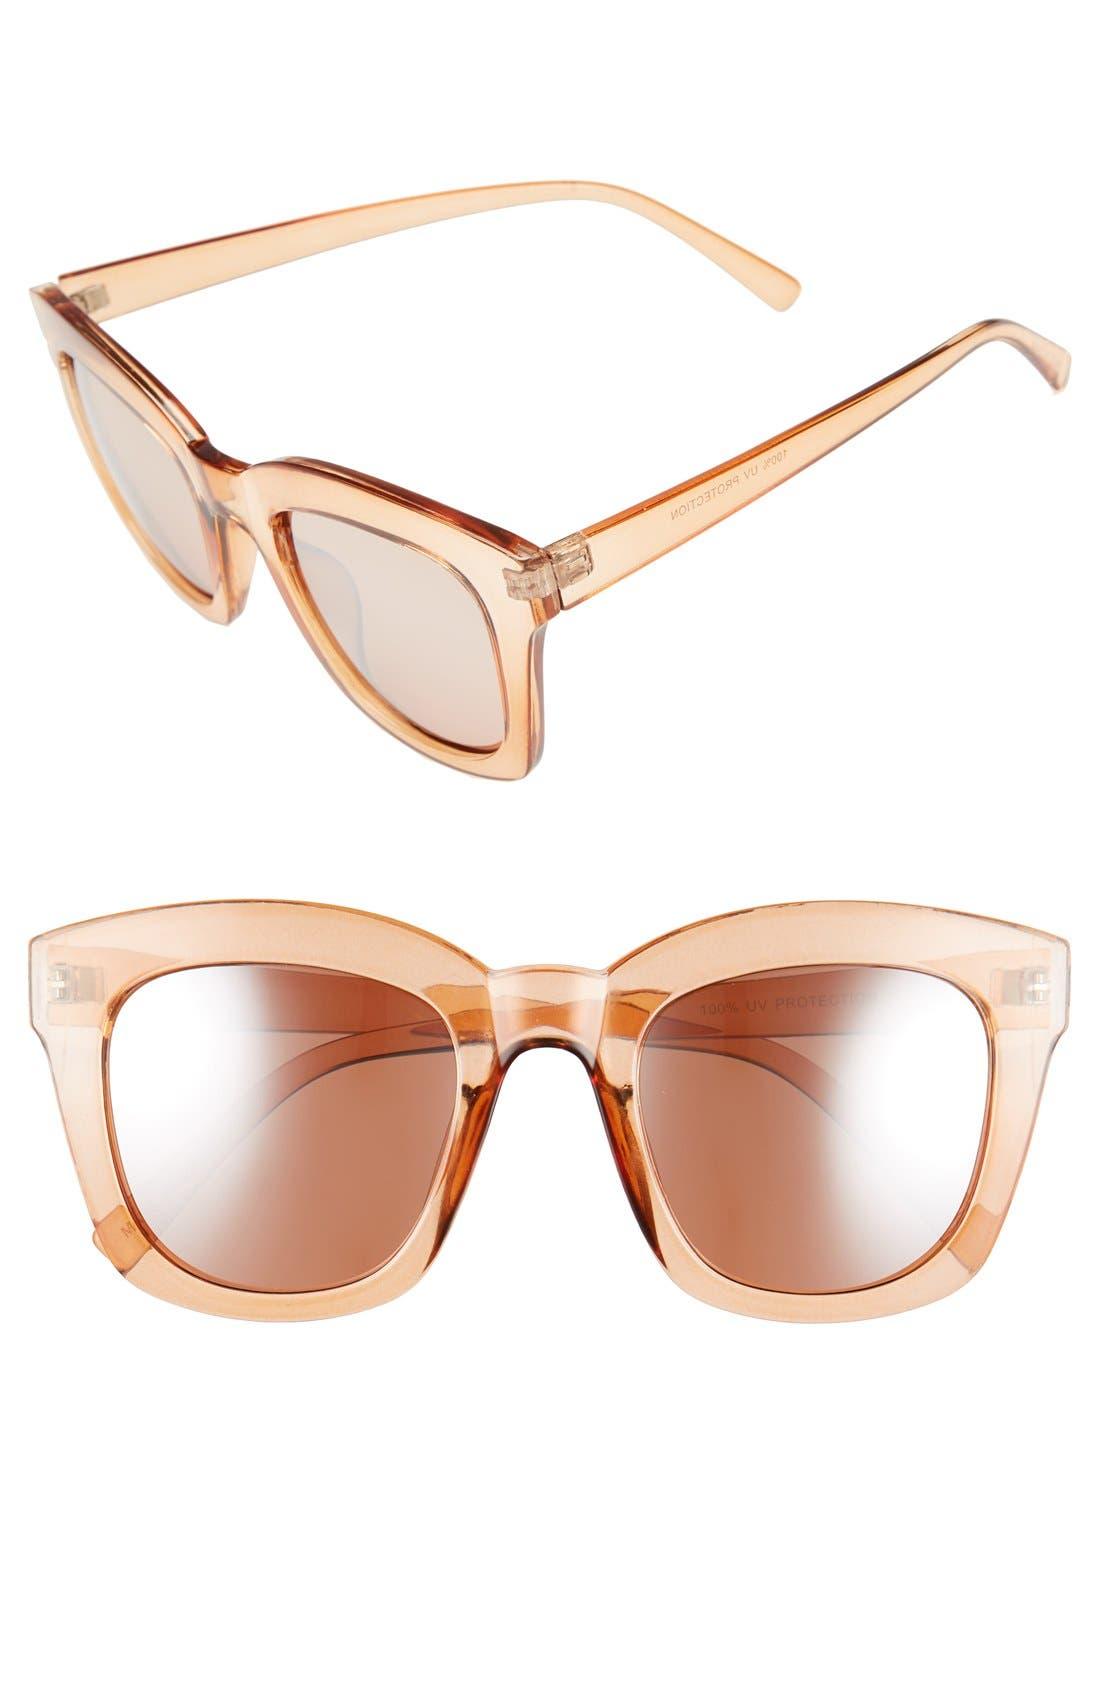 Alternate Image 1 Selected - BP. 50mm Mirror Square Sunglasses